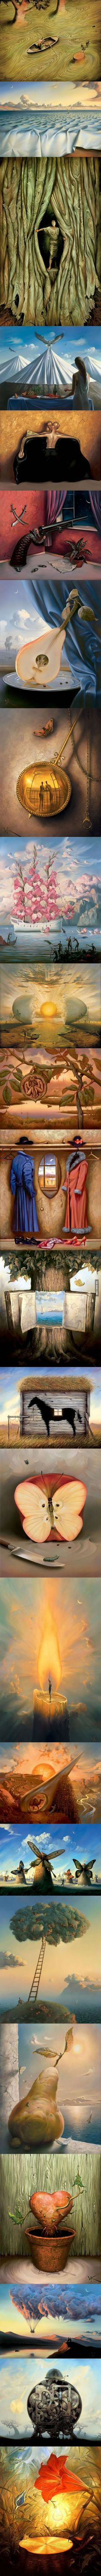 Surrealist Paintings by Valdimir Kush